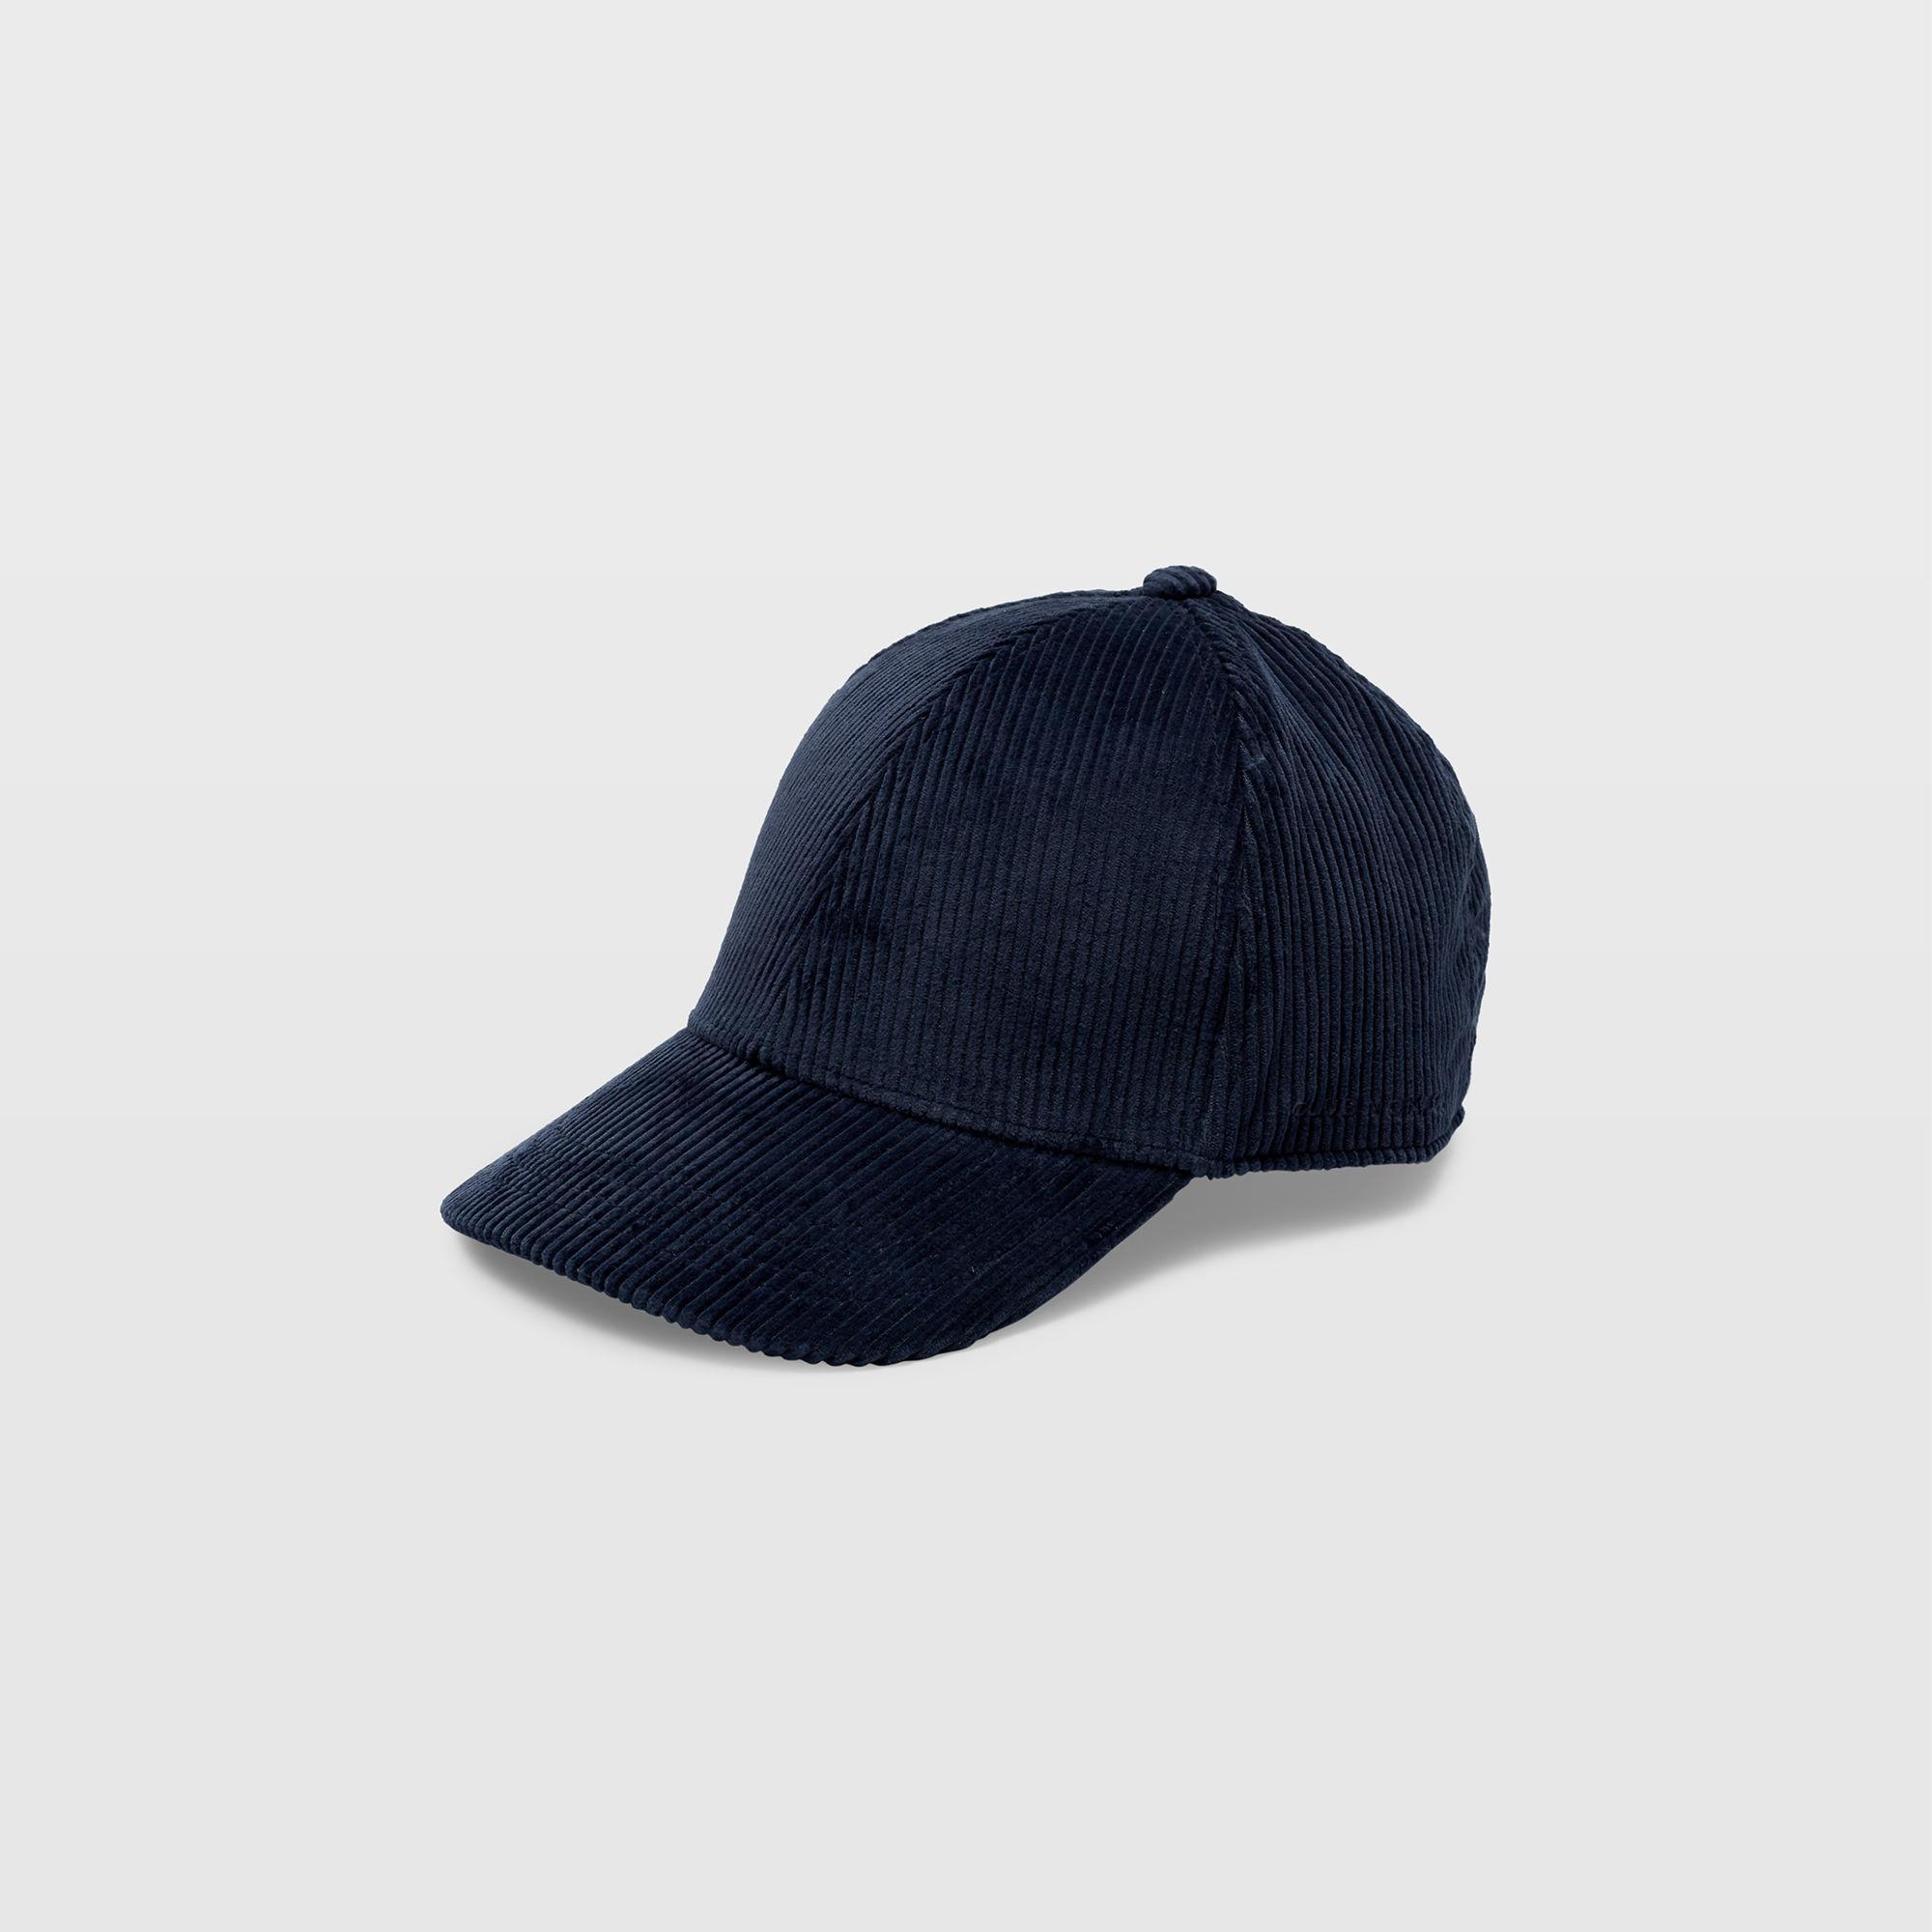 98cf119956c87 Lyst - Club Monaco Corduroy Baseball Cap in Blue for Men